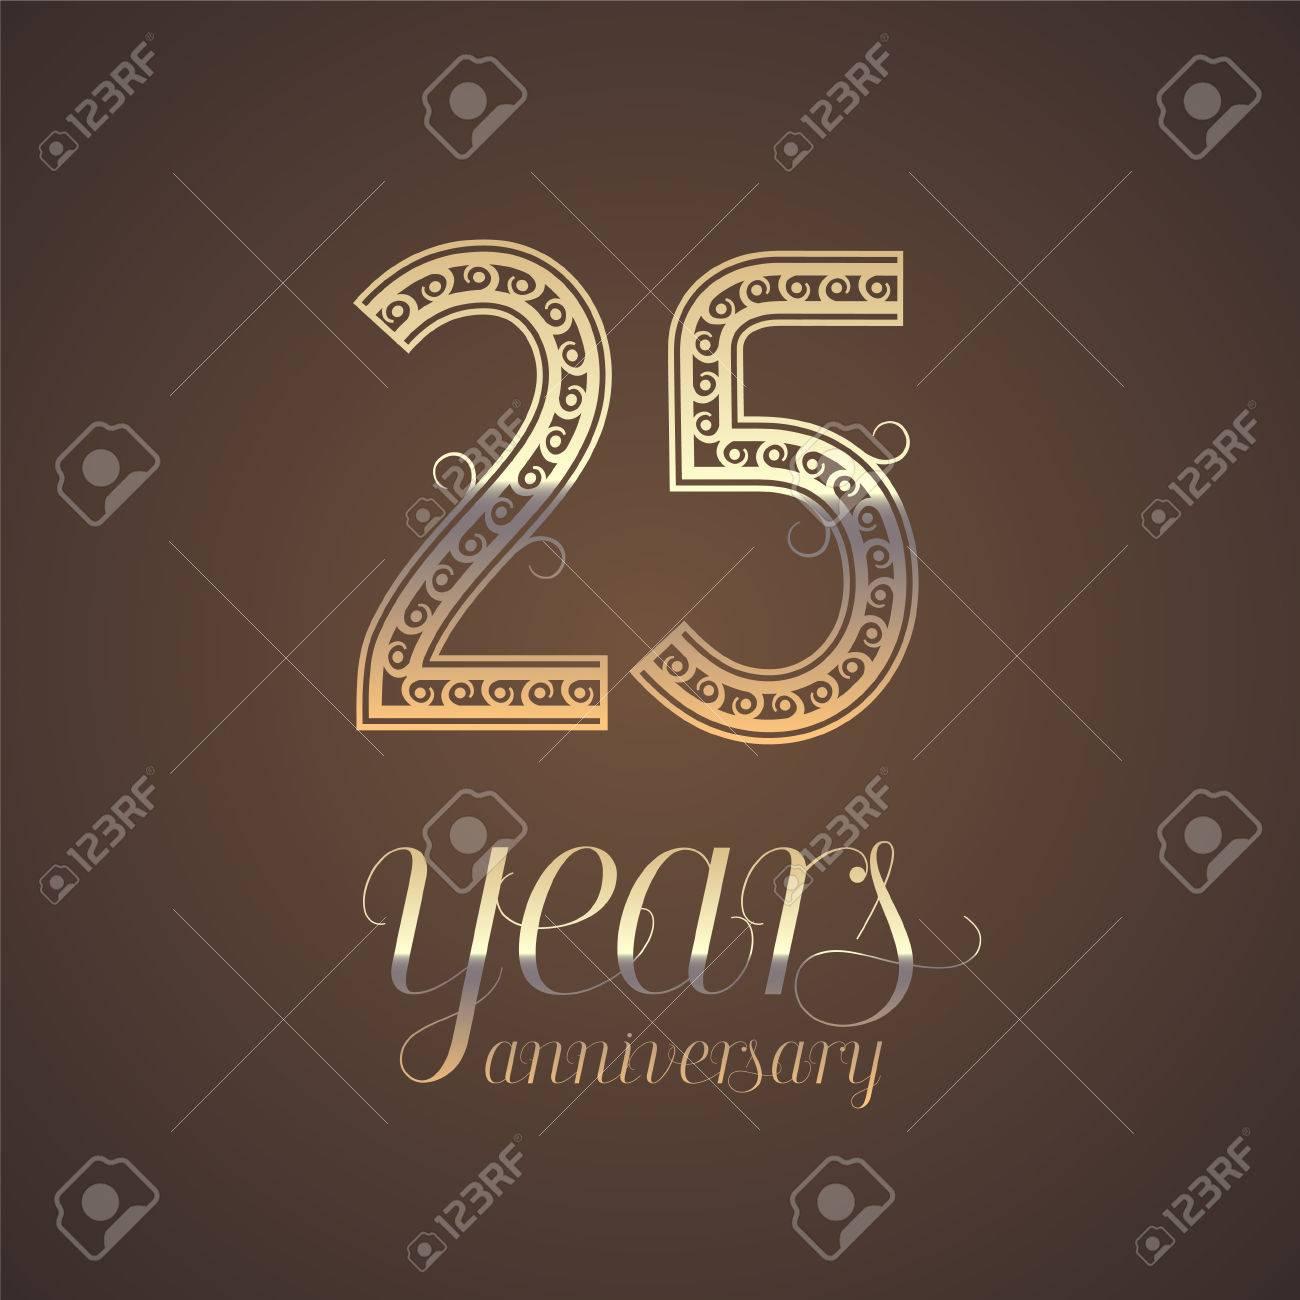 25 Years Anniversary Vector Icon Symbol Graphic Design Element